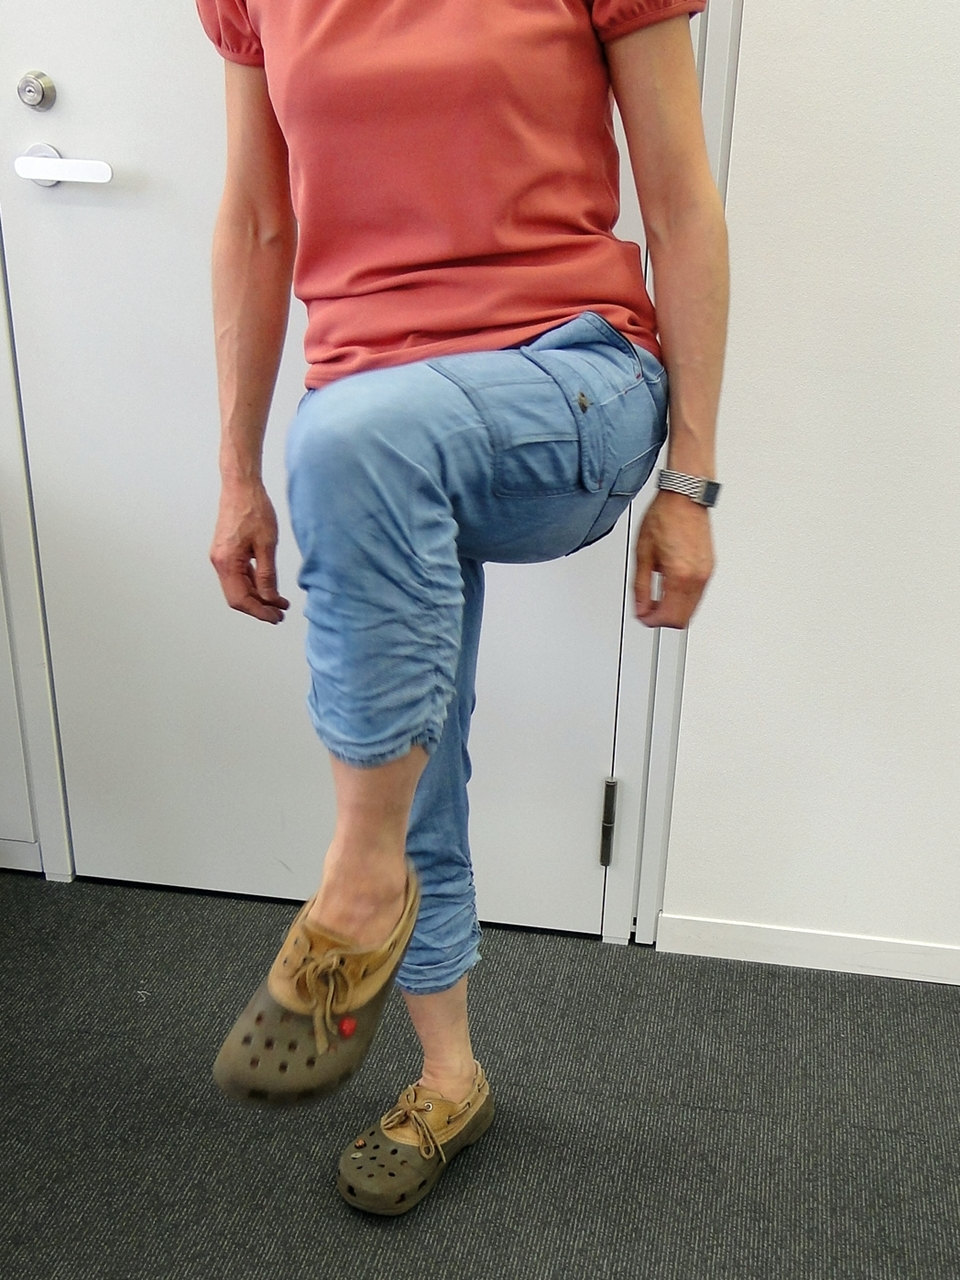 http://www.careerup.biz/fashion/img/20120511denimDSC06045.JPG